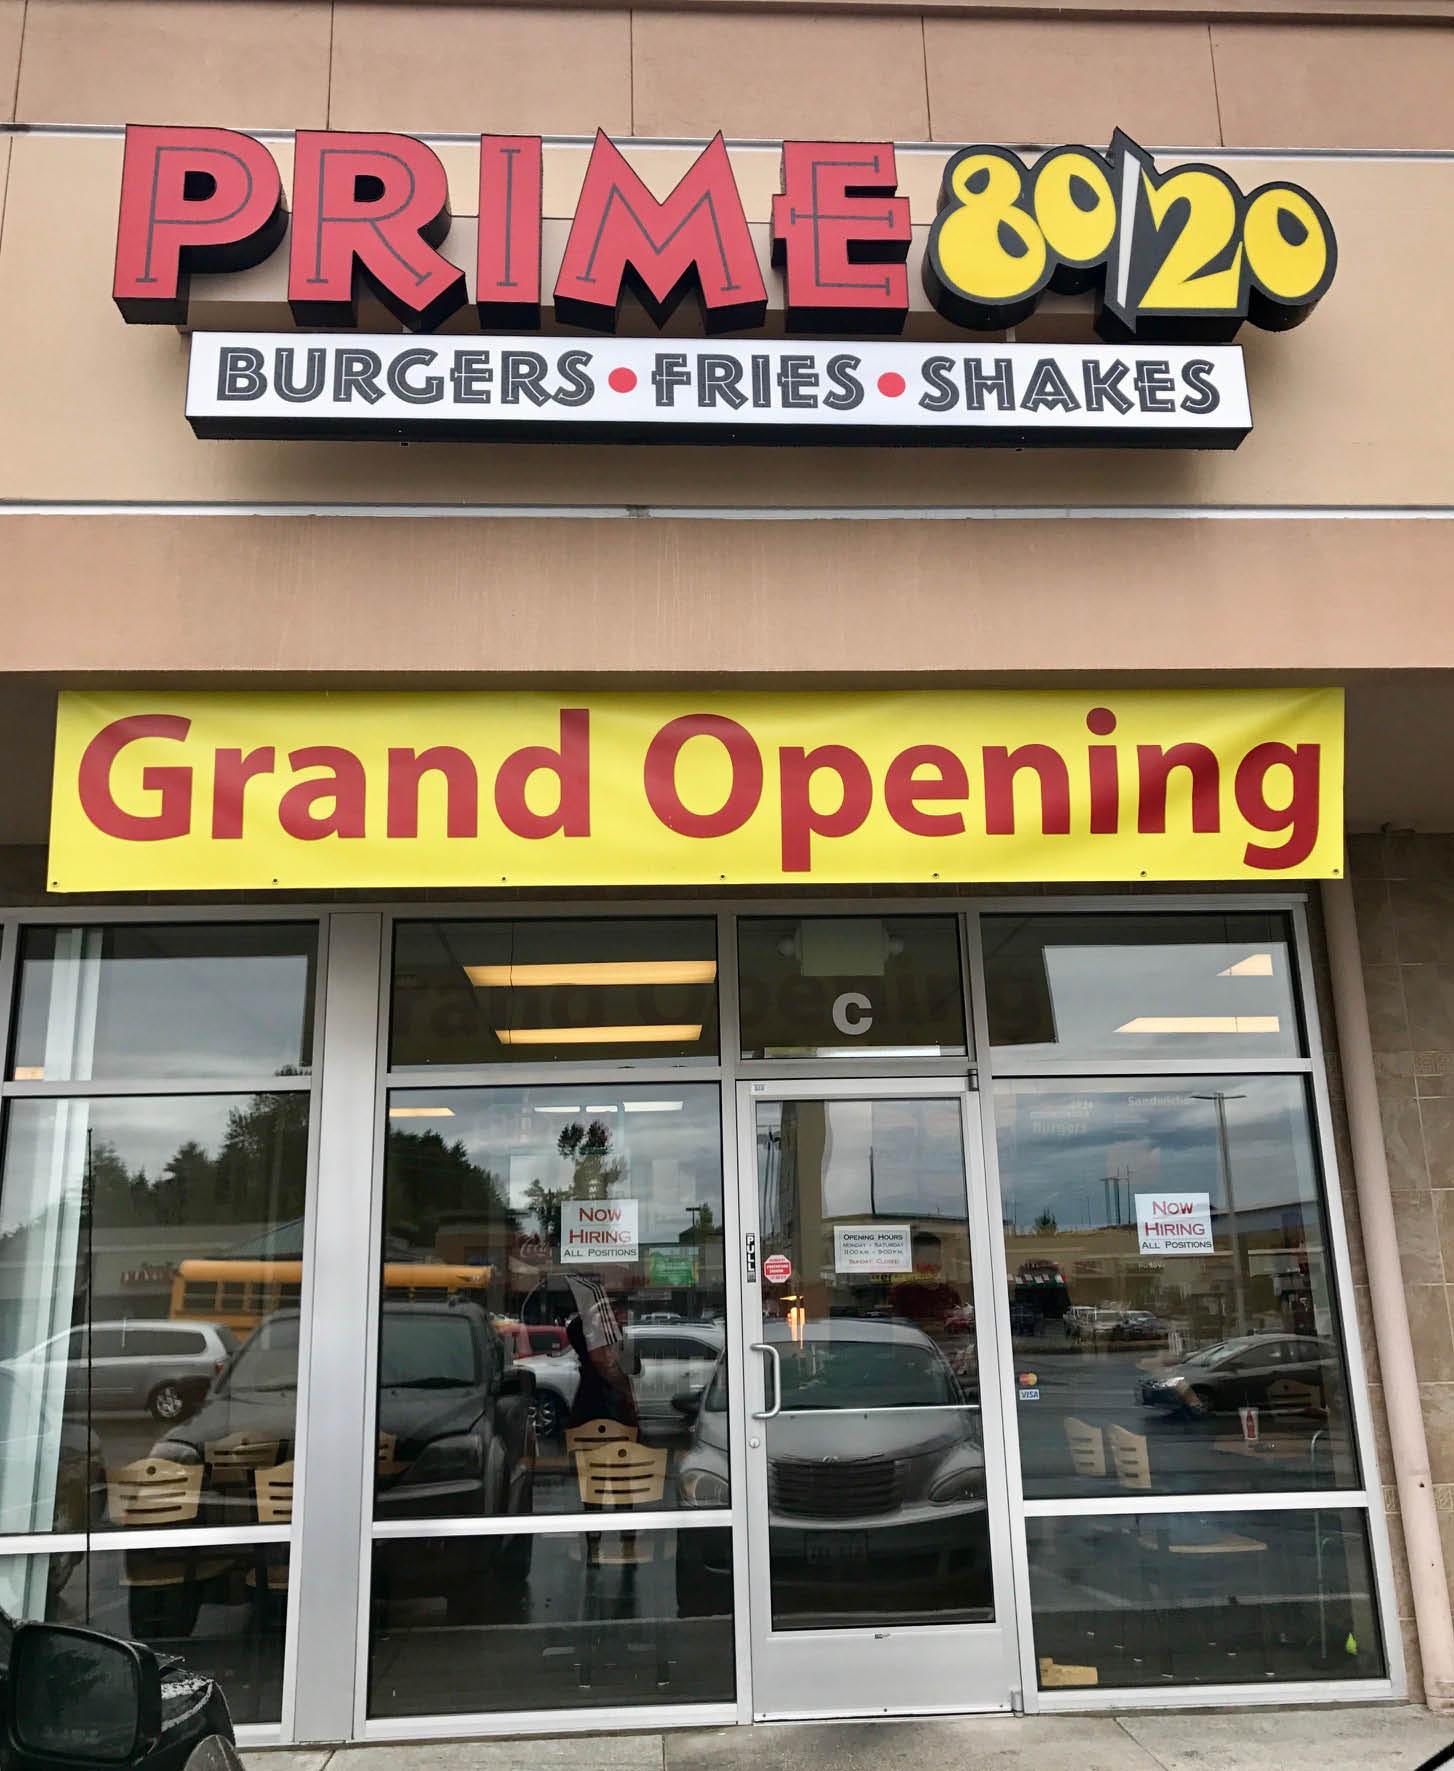 Outside Prime 80/20 burgers fries shakes - Tacoma, WA - Tacoma restaurants - restaurants in Tacoma